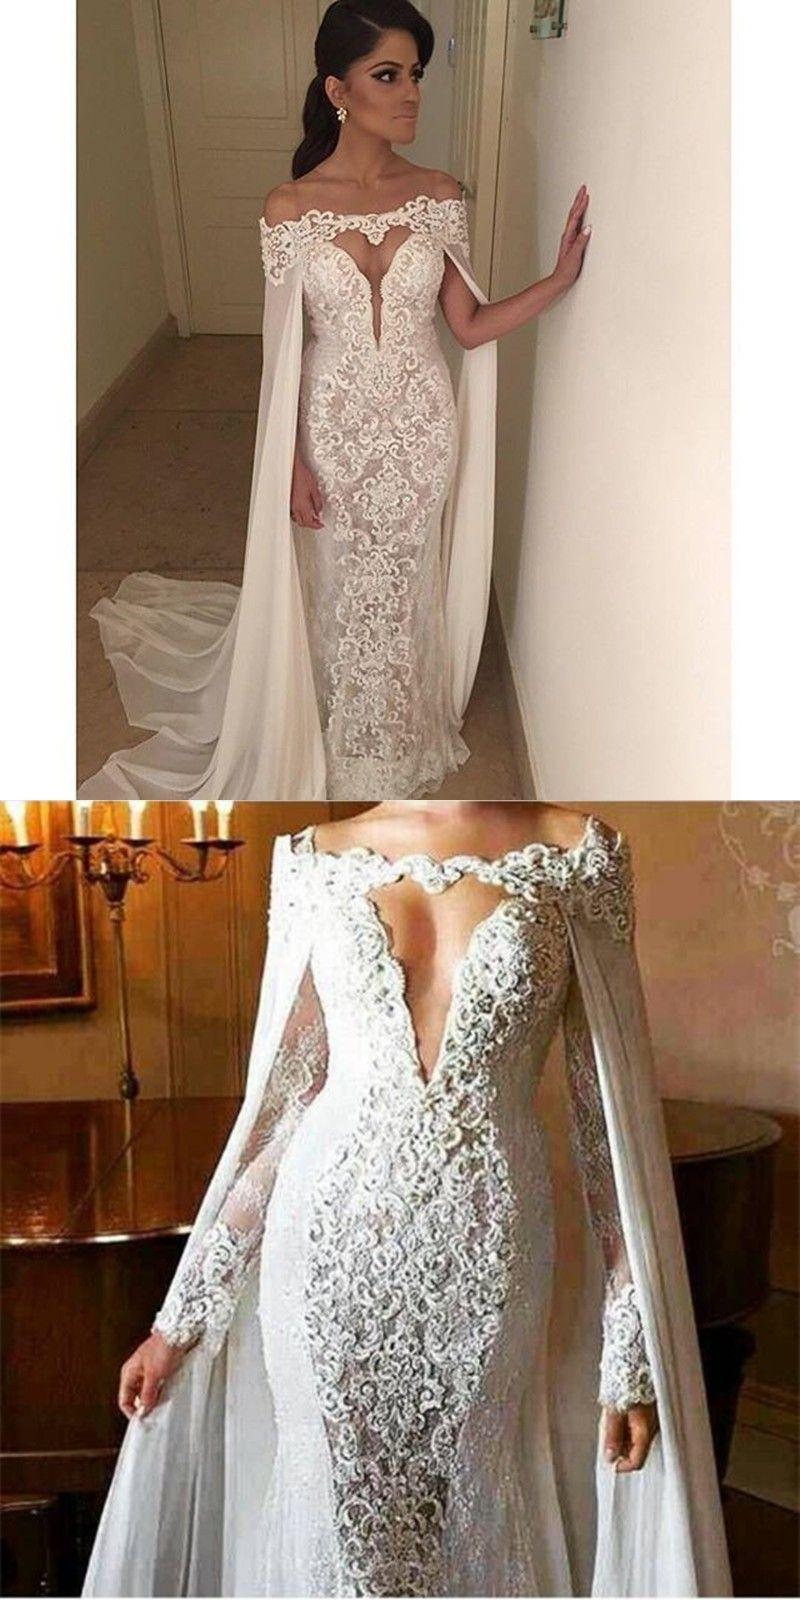 Off the shoulder lace mermaid wedding dress  Saudi Arabia wedding dress off the shoulder sexy backless wedding